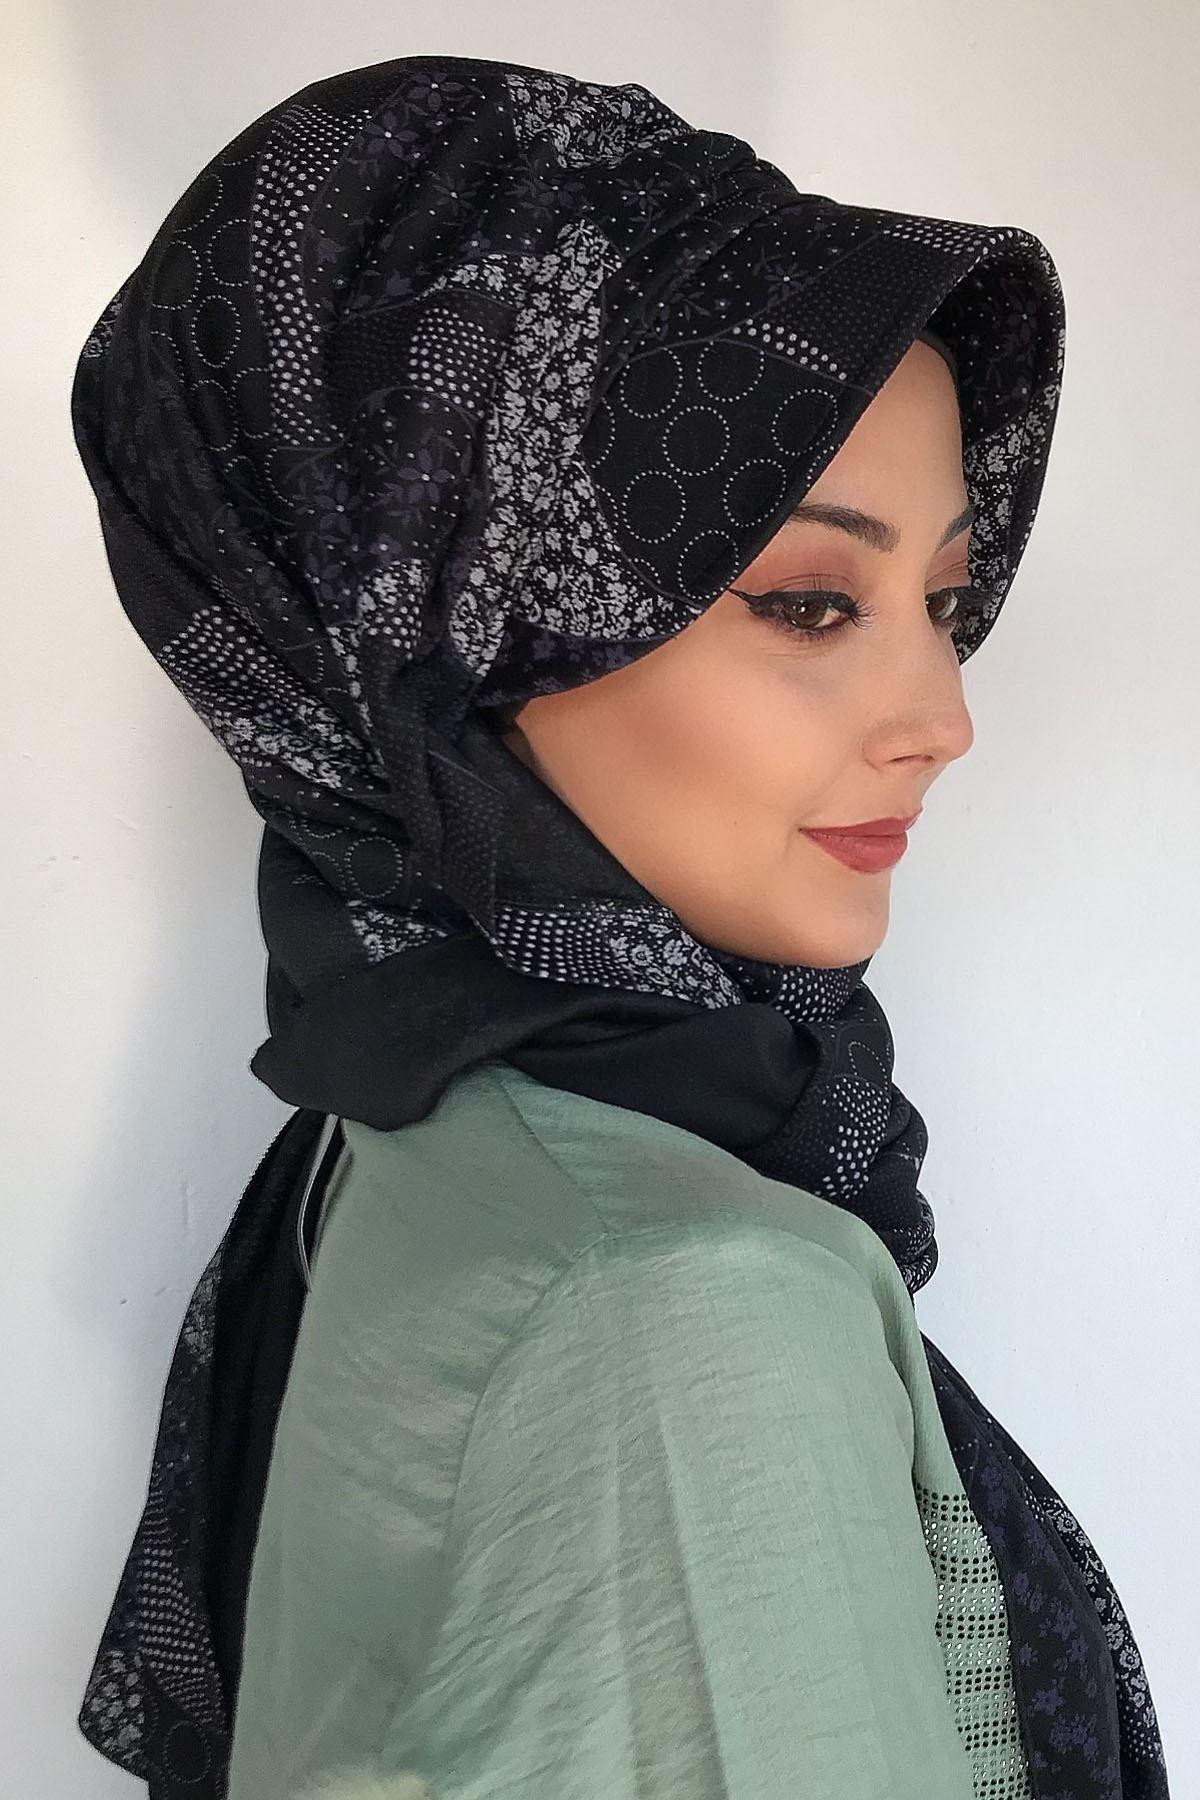 Siyah Renkli Küçük Geometrik Desenli Şapka Şal